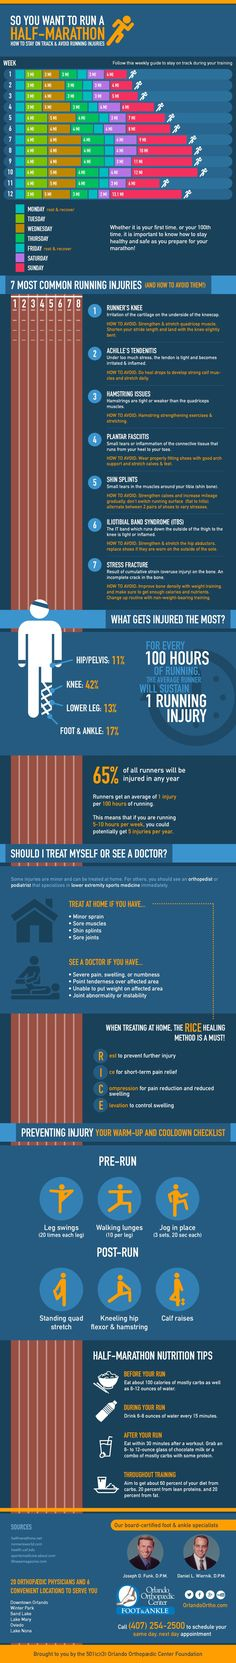 Half Marathon Training and Running Injury Prevention Infographic